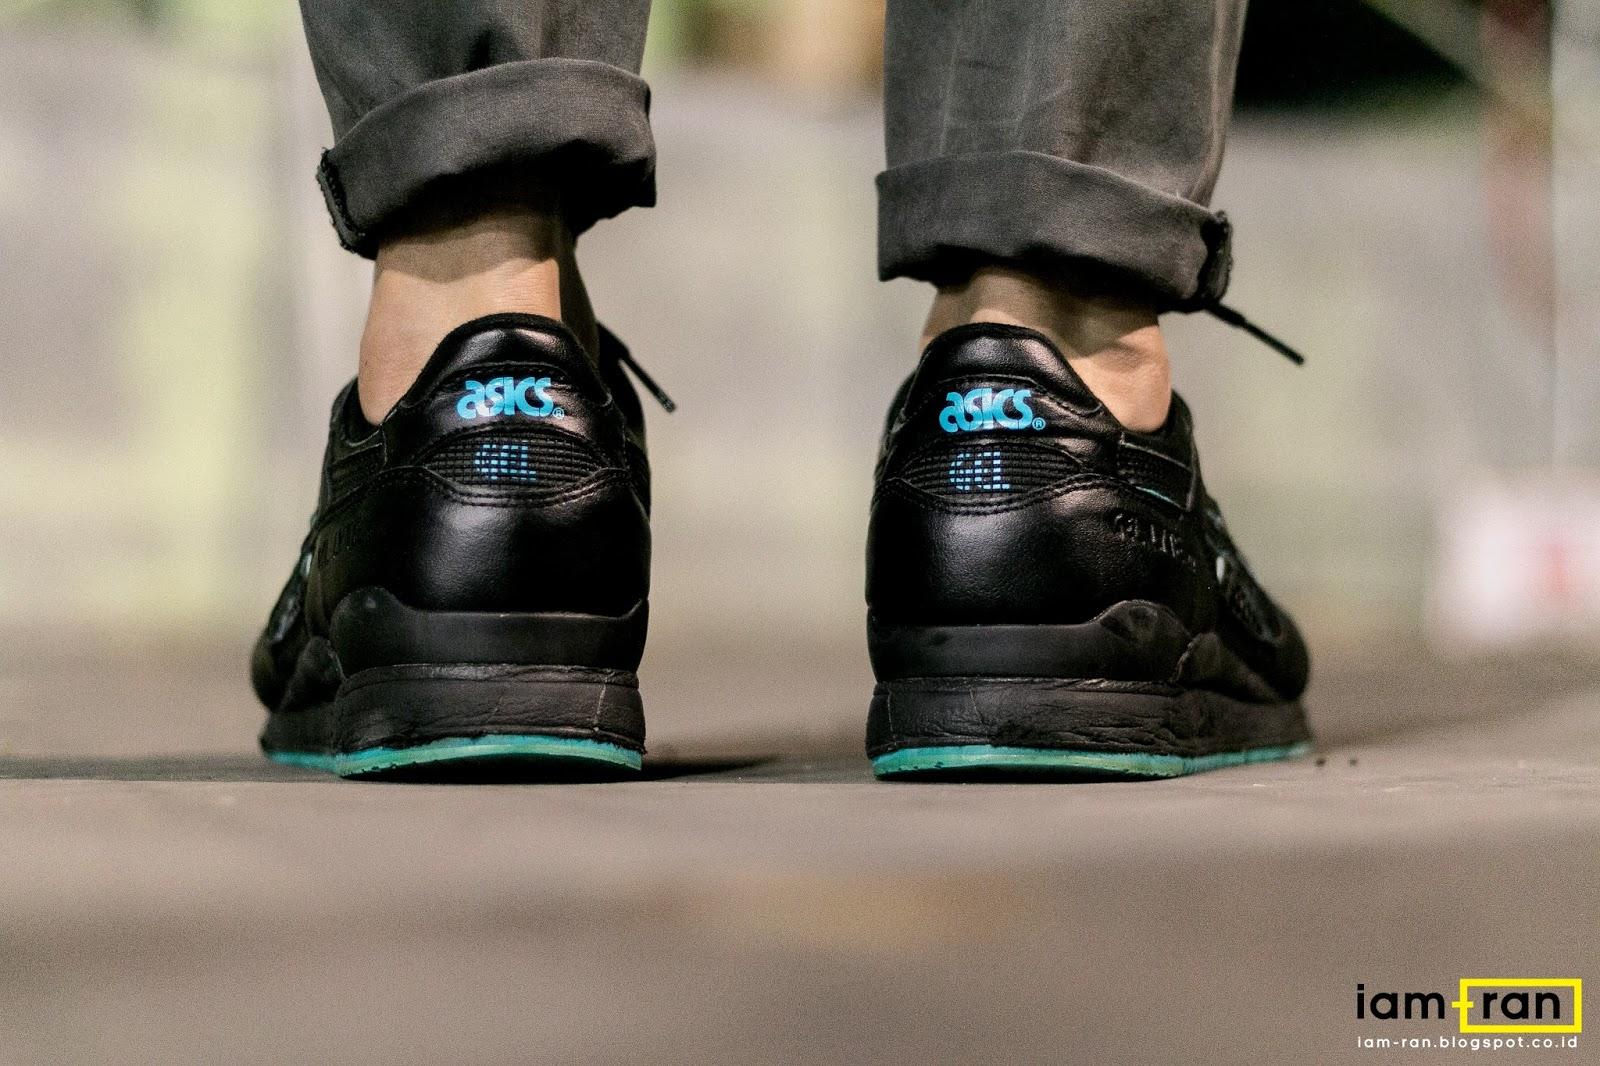 finest selection a41b6 b3f9c Sneakers   Asics Gel Lyte 3 X Ronnie Fieg